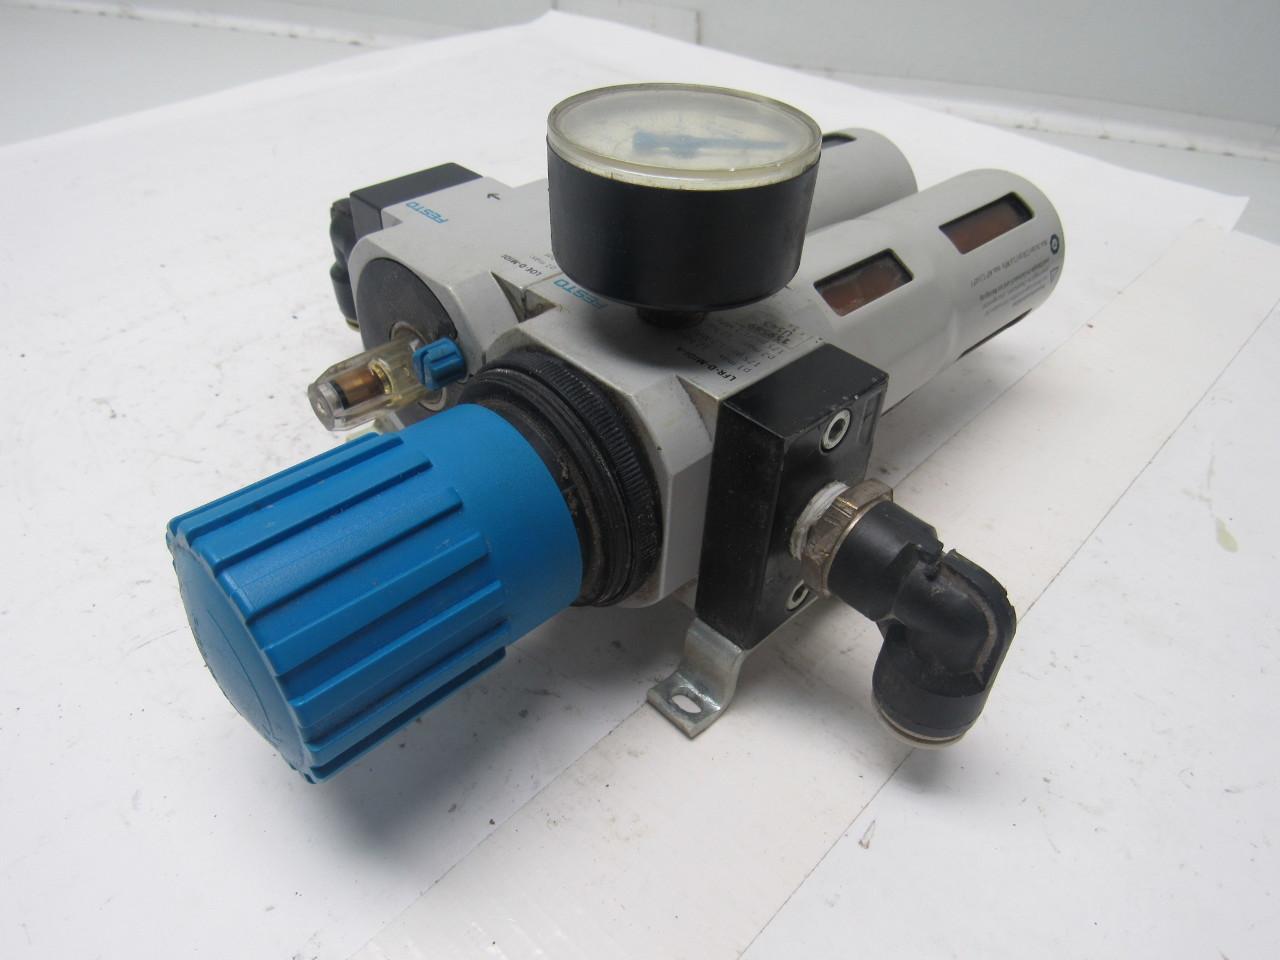 "/""U/"" Straight Flute Carbide Drill M.A 140 Degree Point Ford MF20036800"